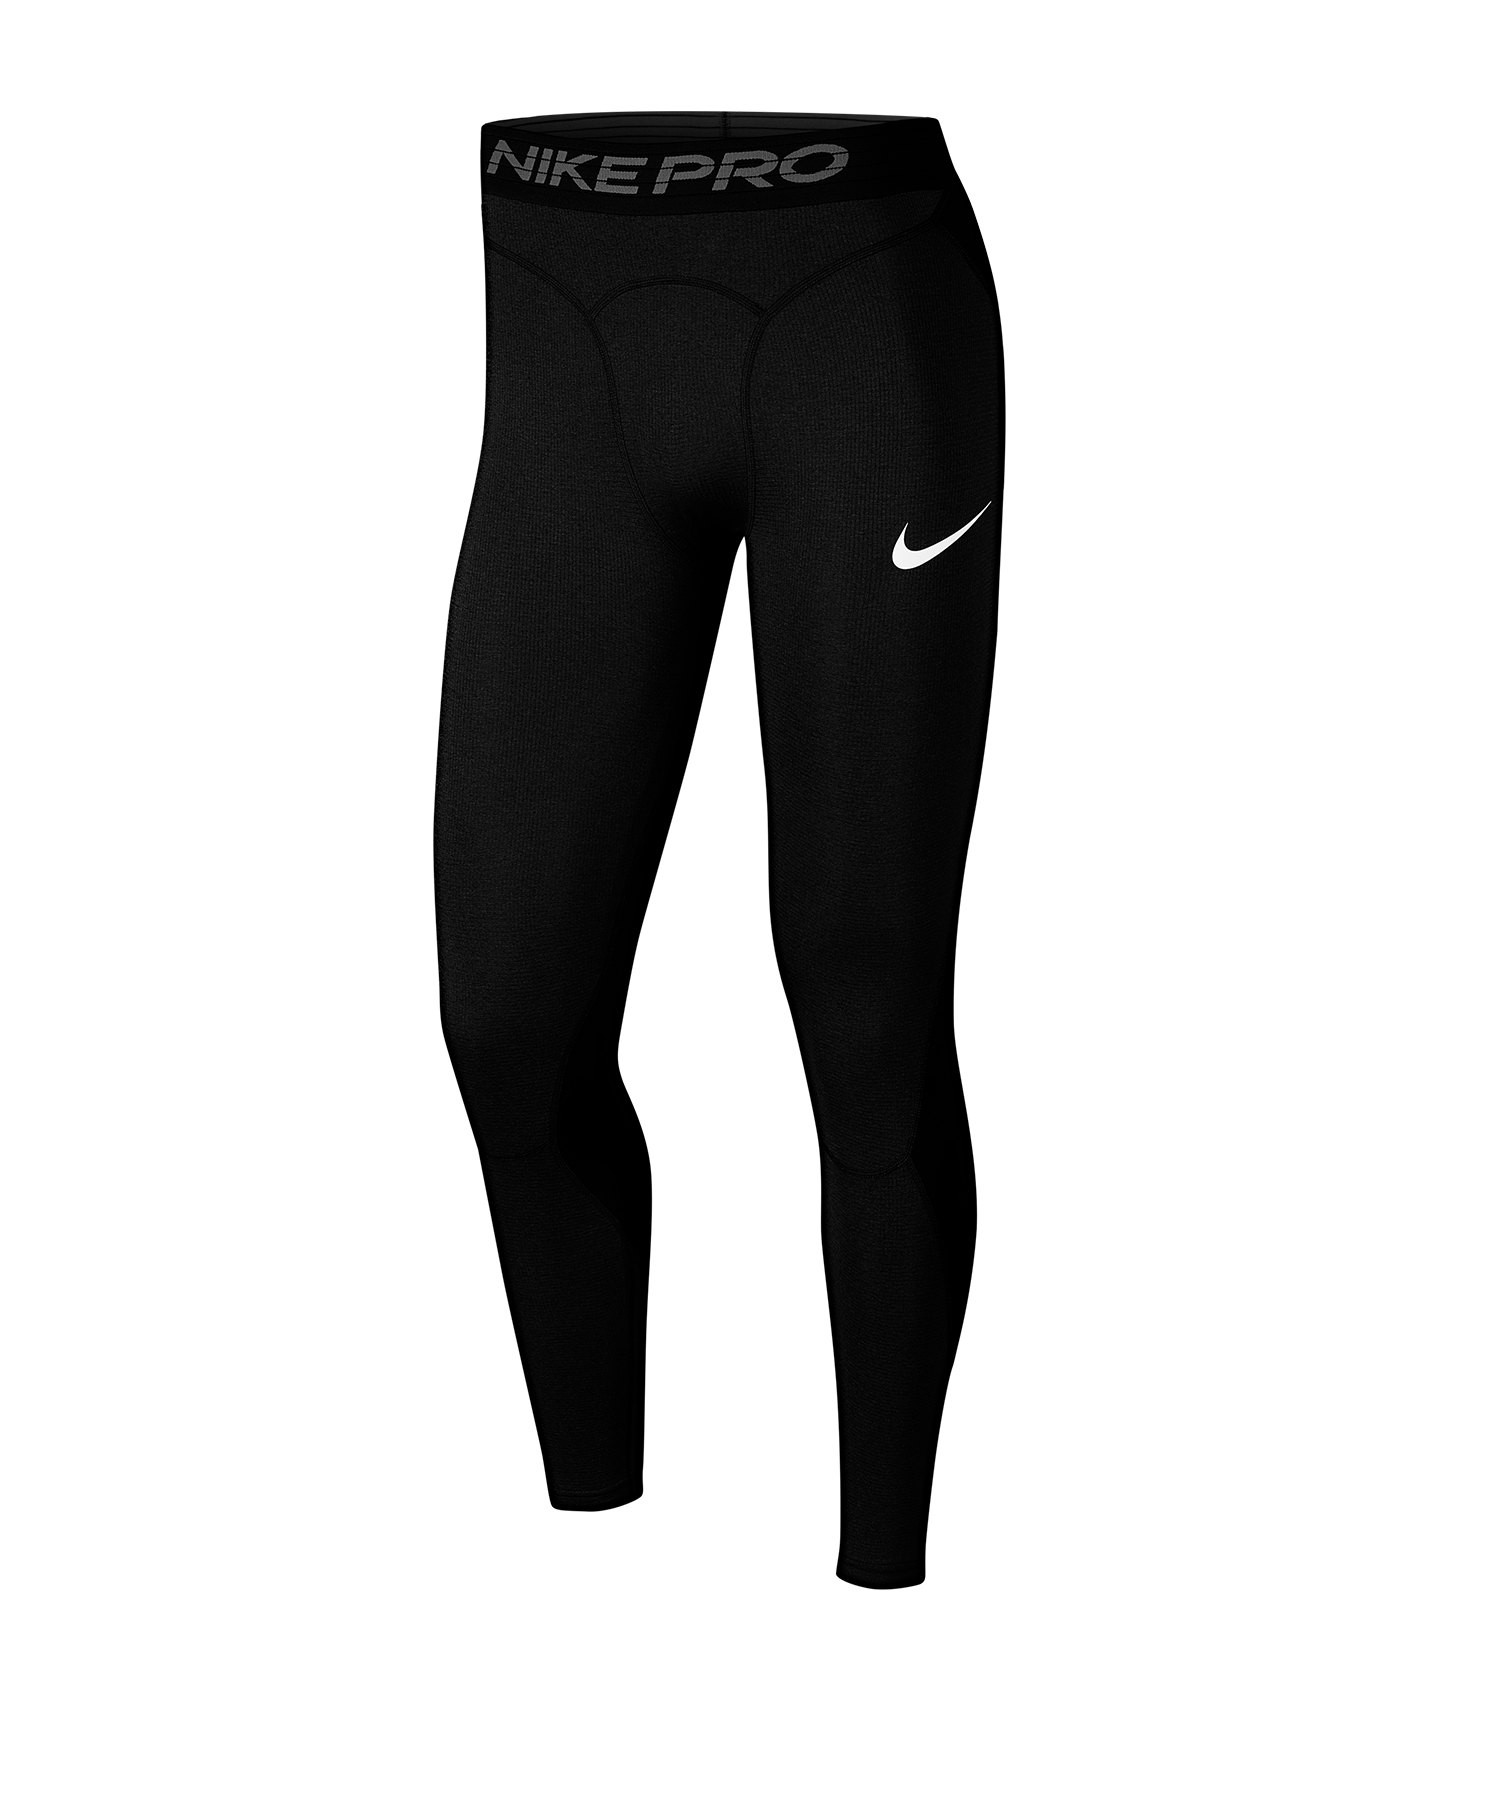 Nike Pro Breathe Tights Hose lang Schwarz F010 - schwarz